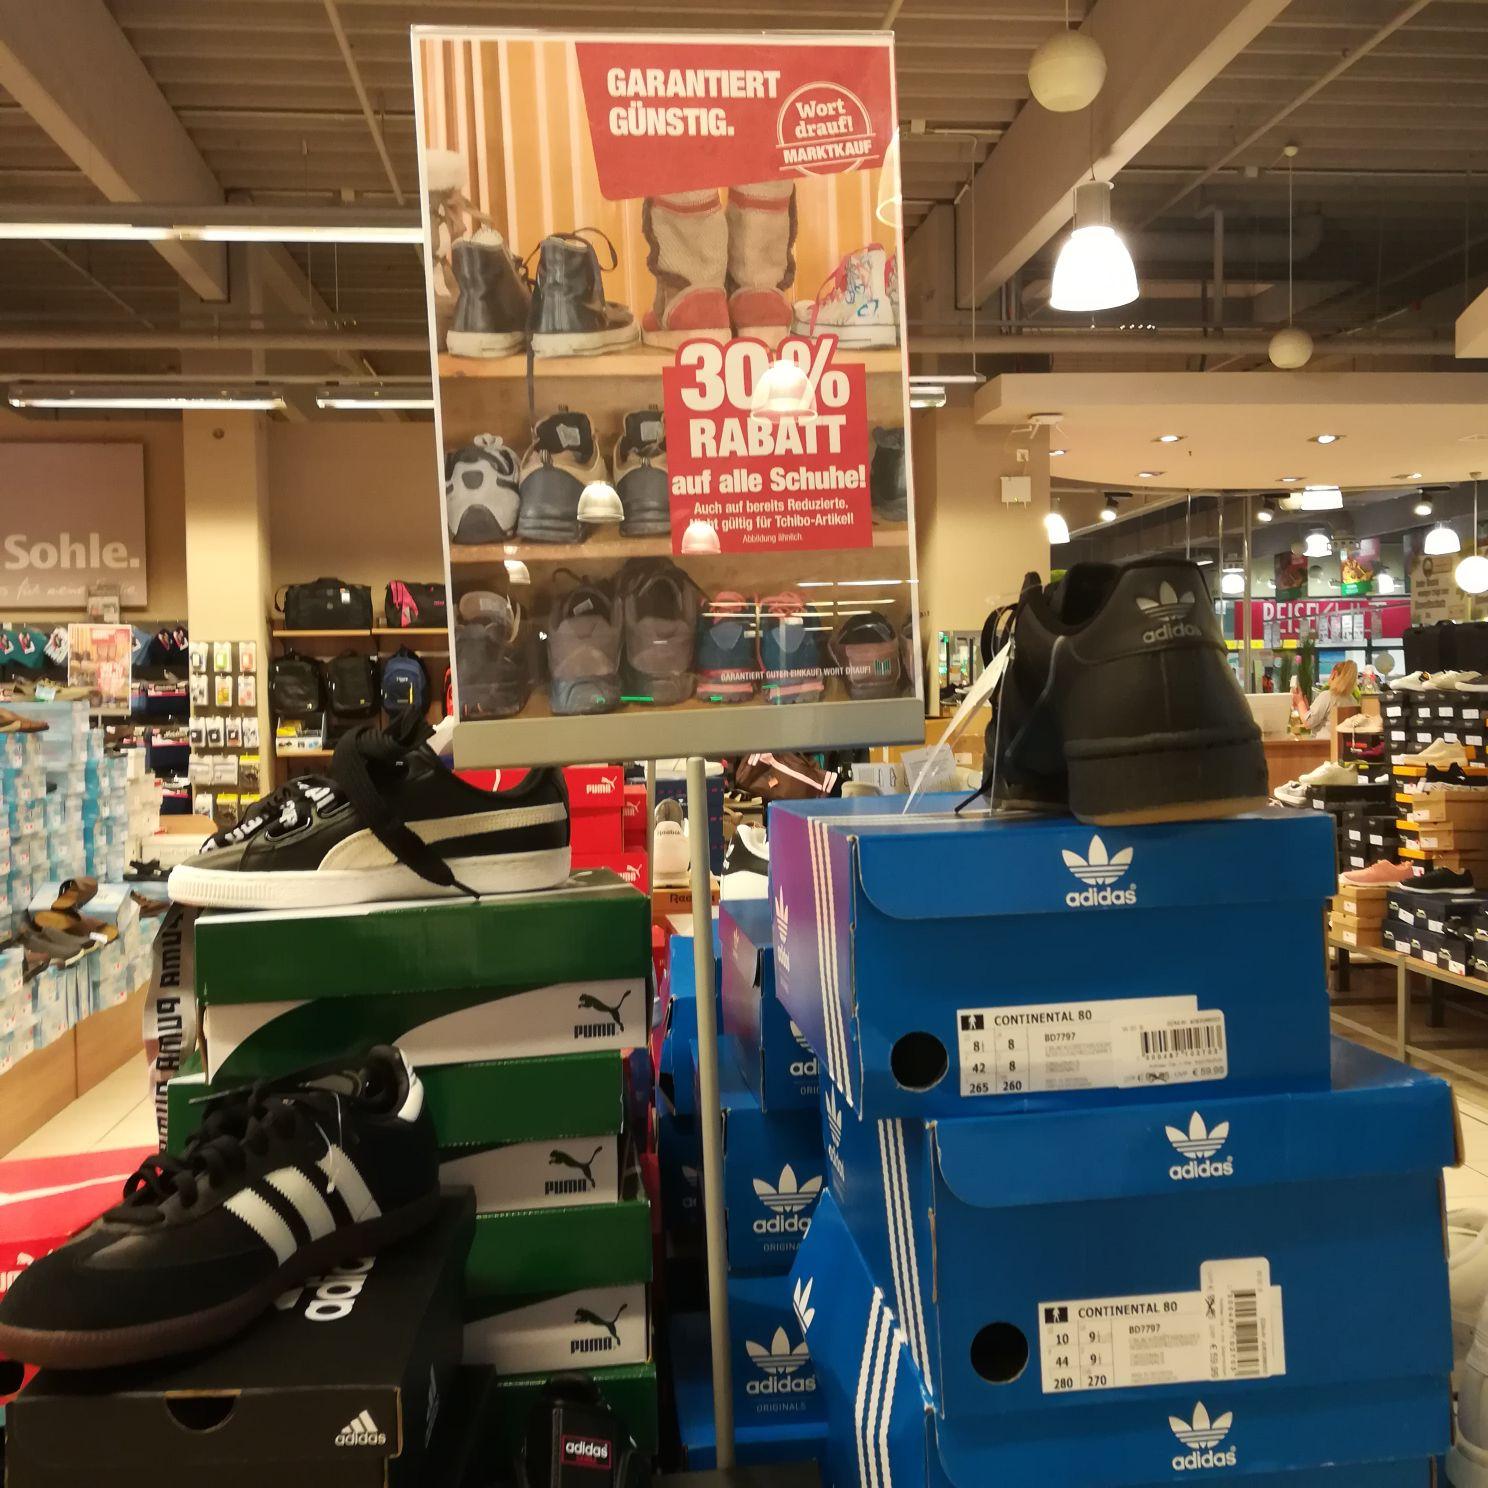 Evtl. LOKAL Marktkauf SW alle Schuhe - 30%